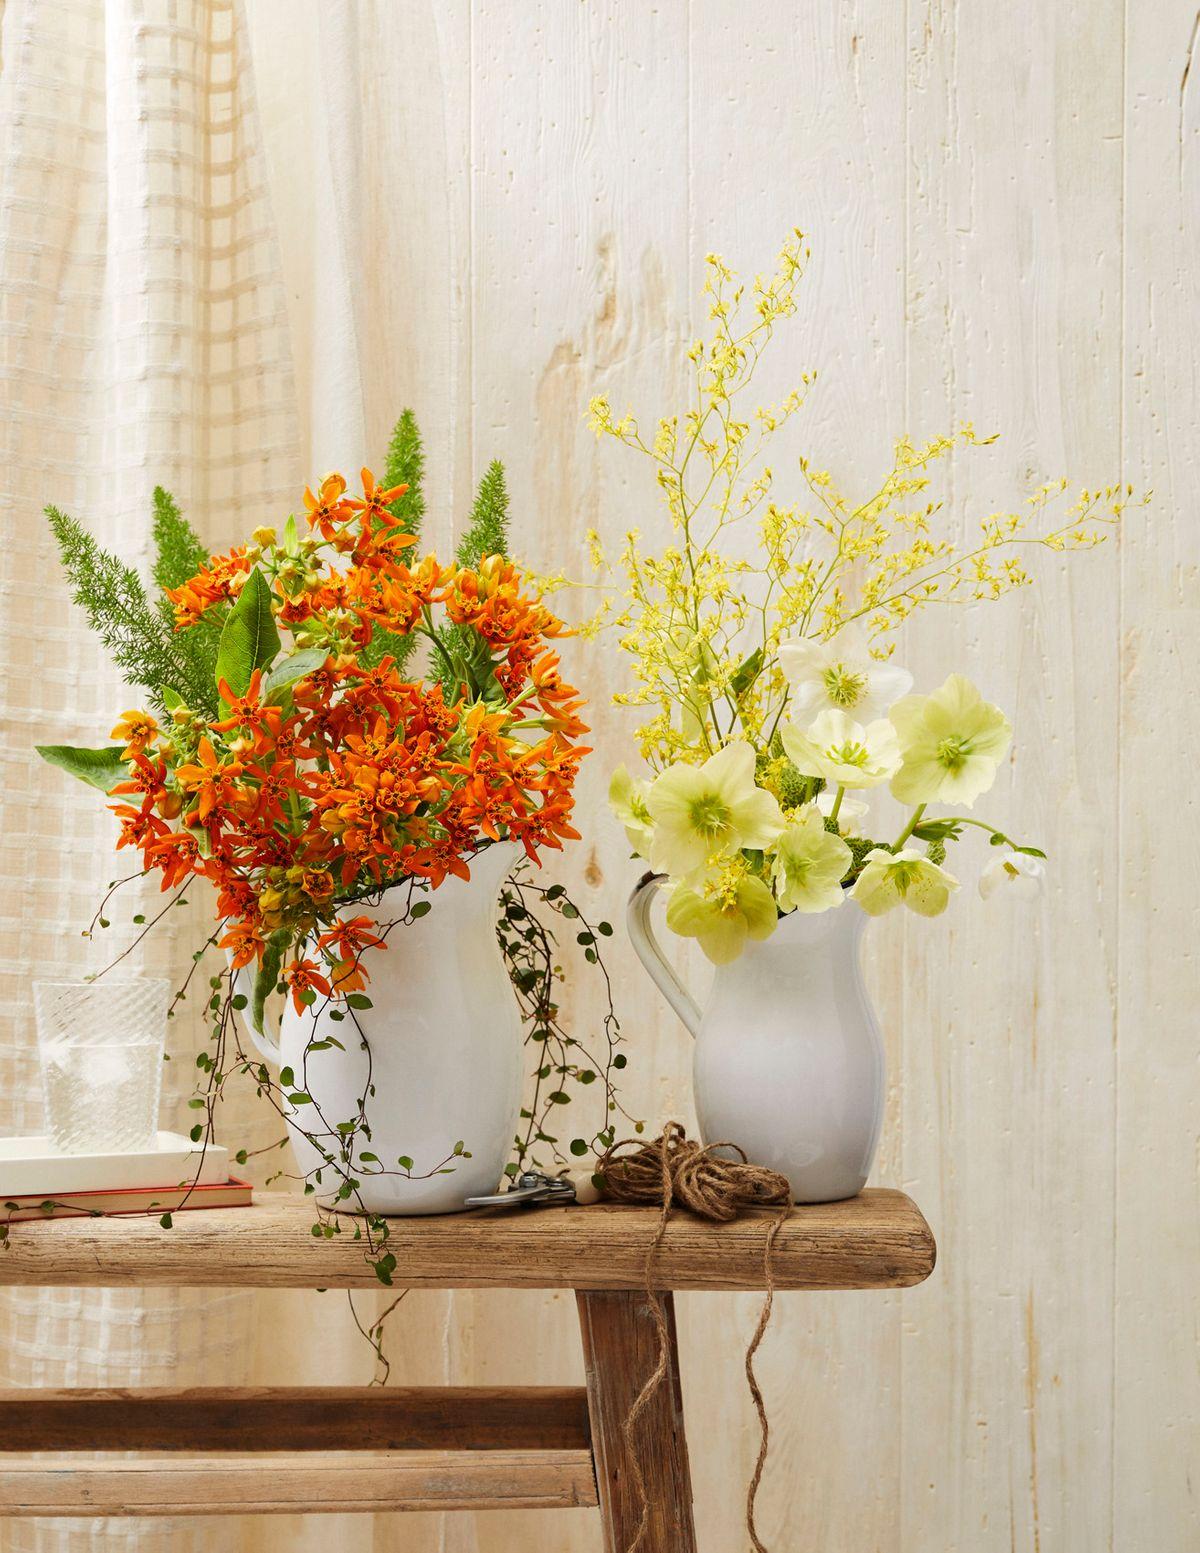 ChristopherWhite_Floral Study_7.jpg